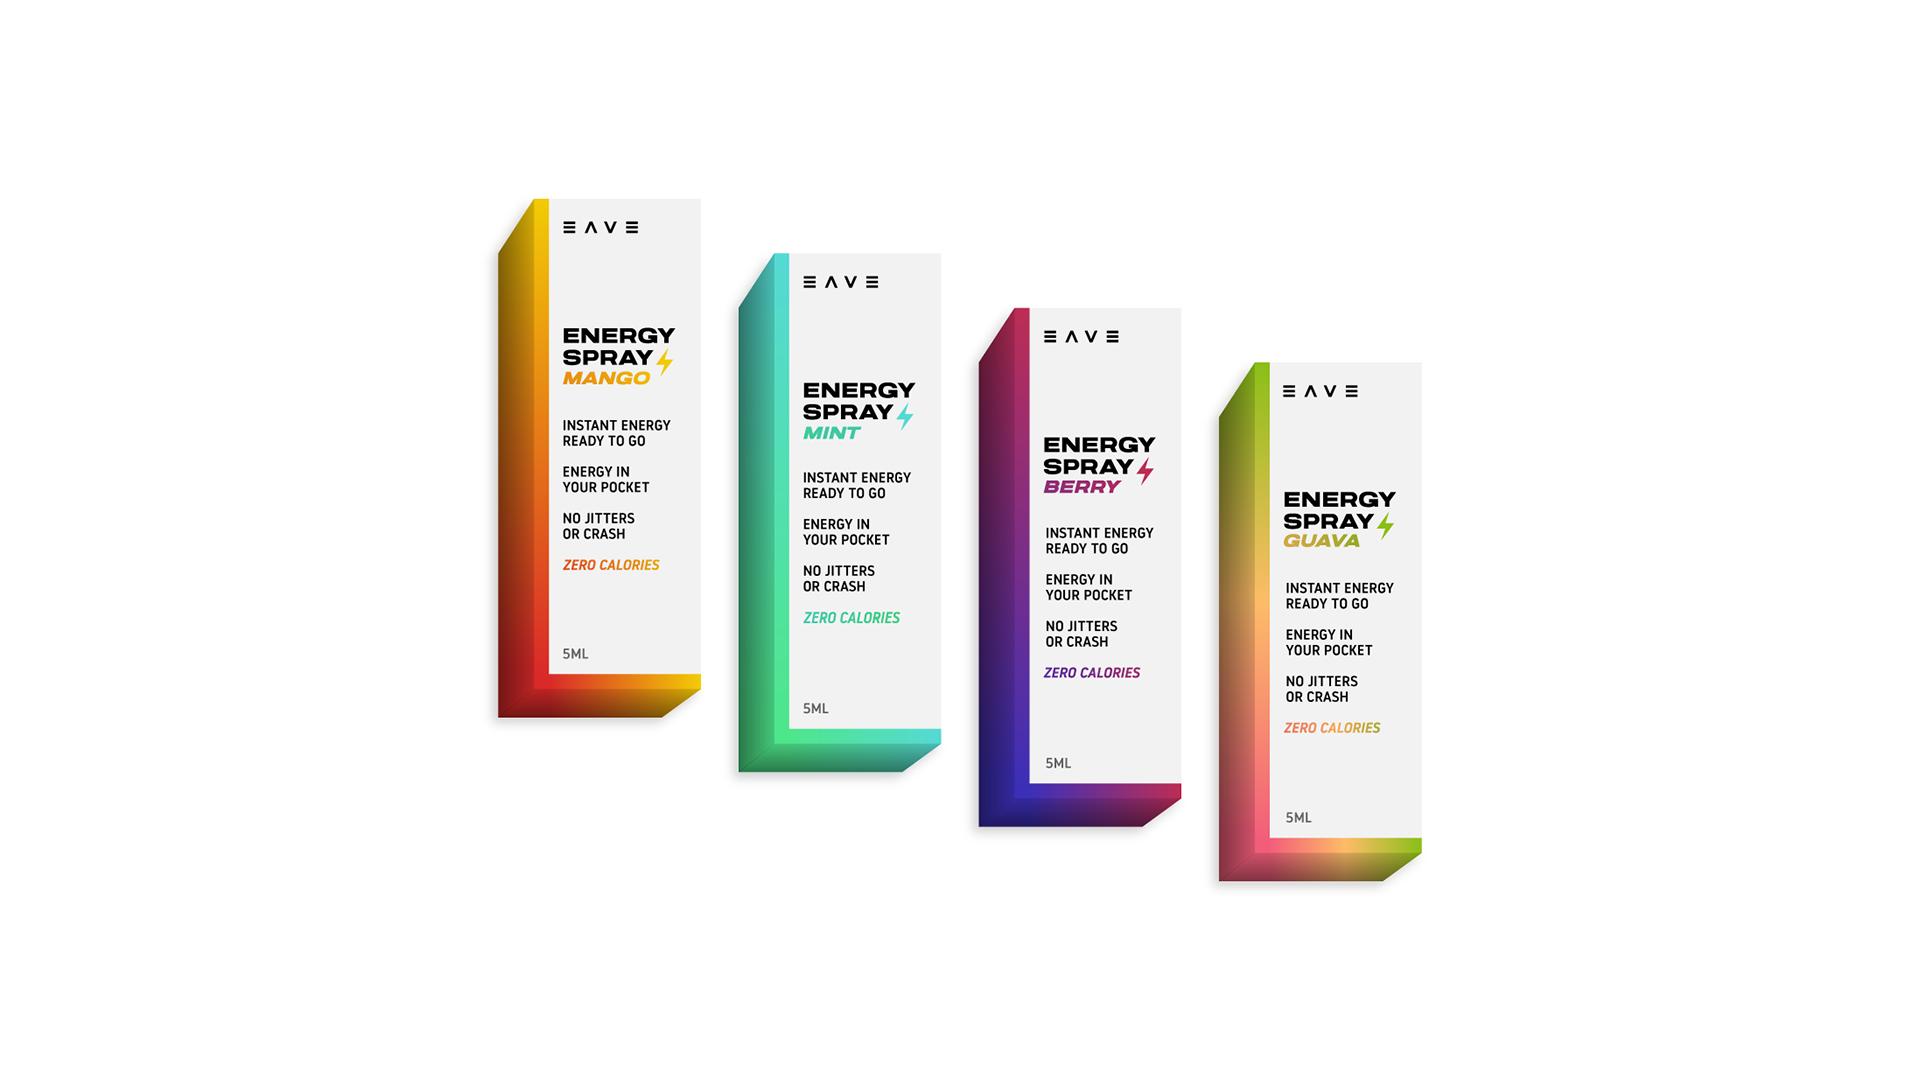 Energy Spray